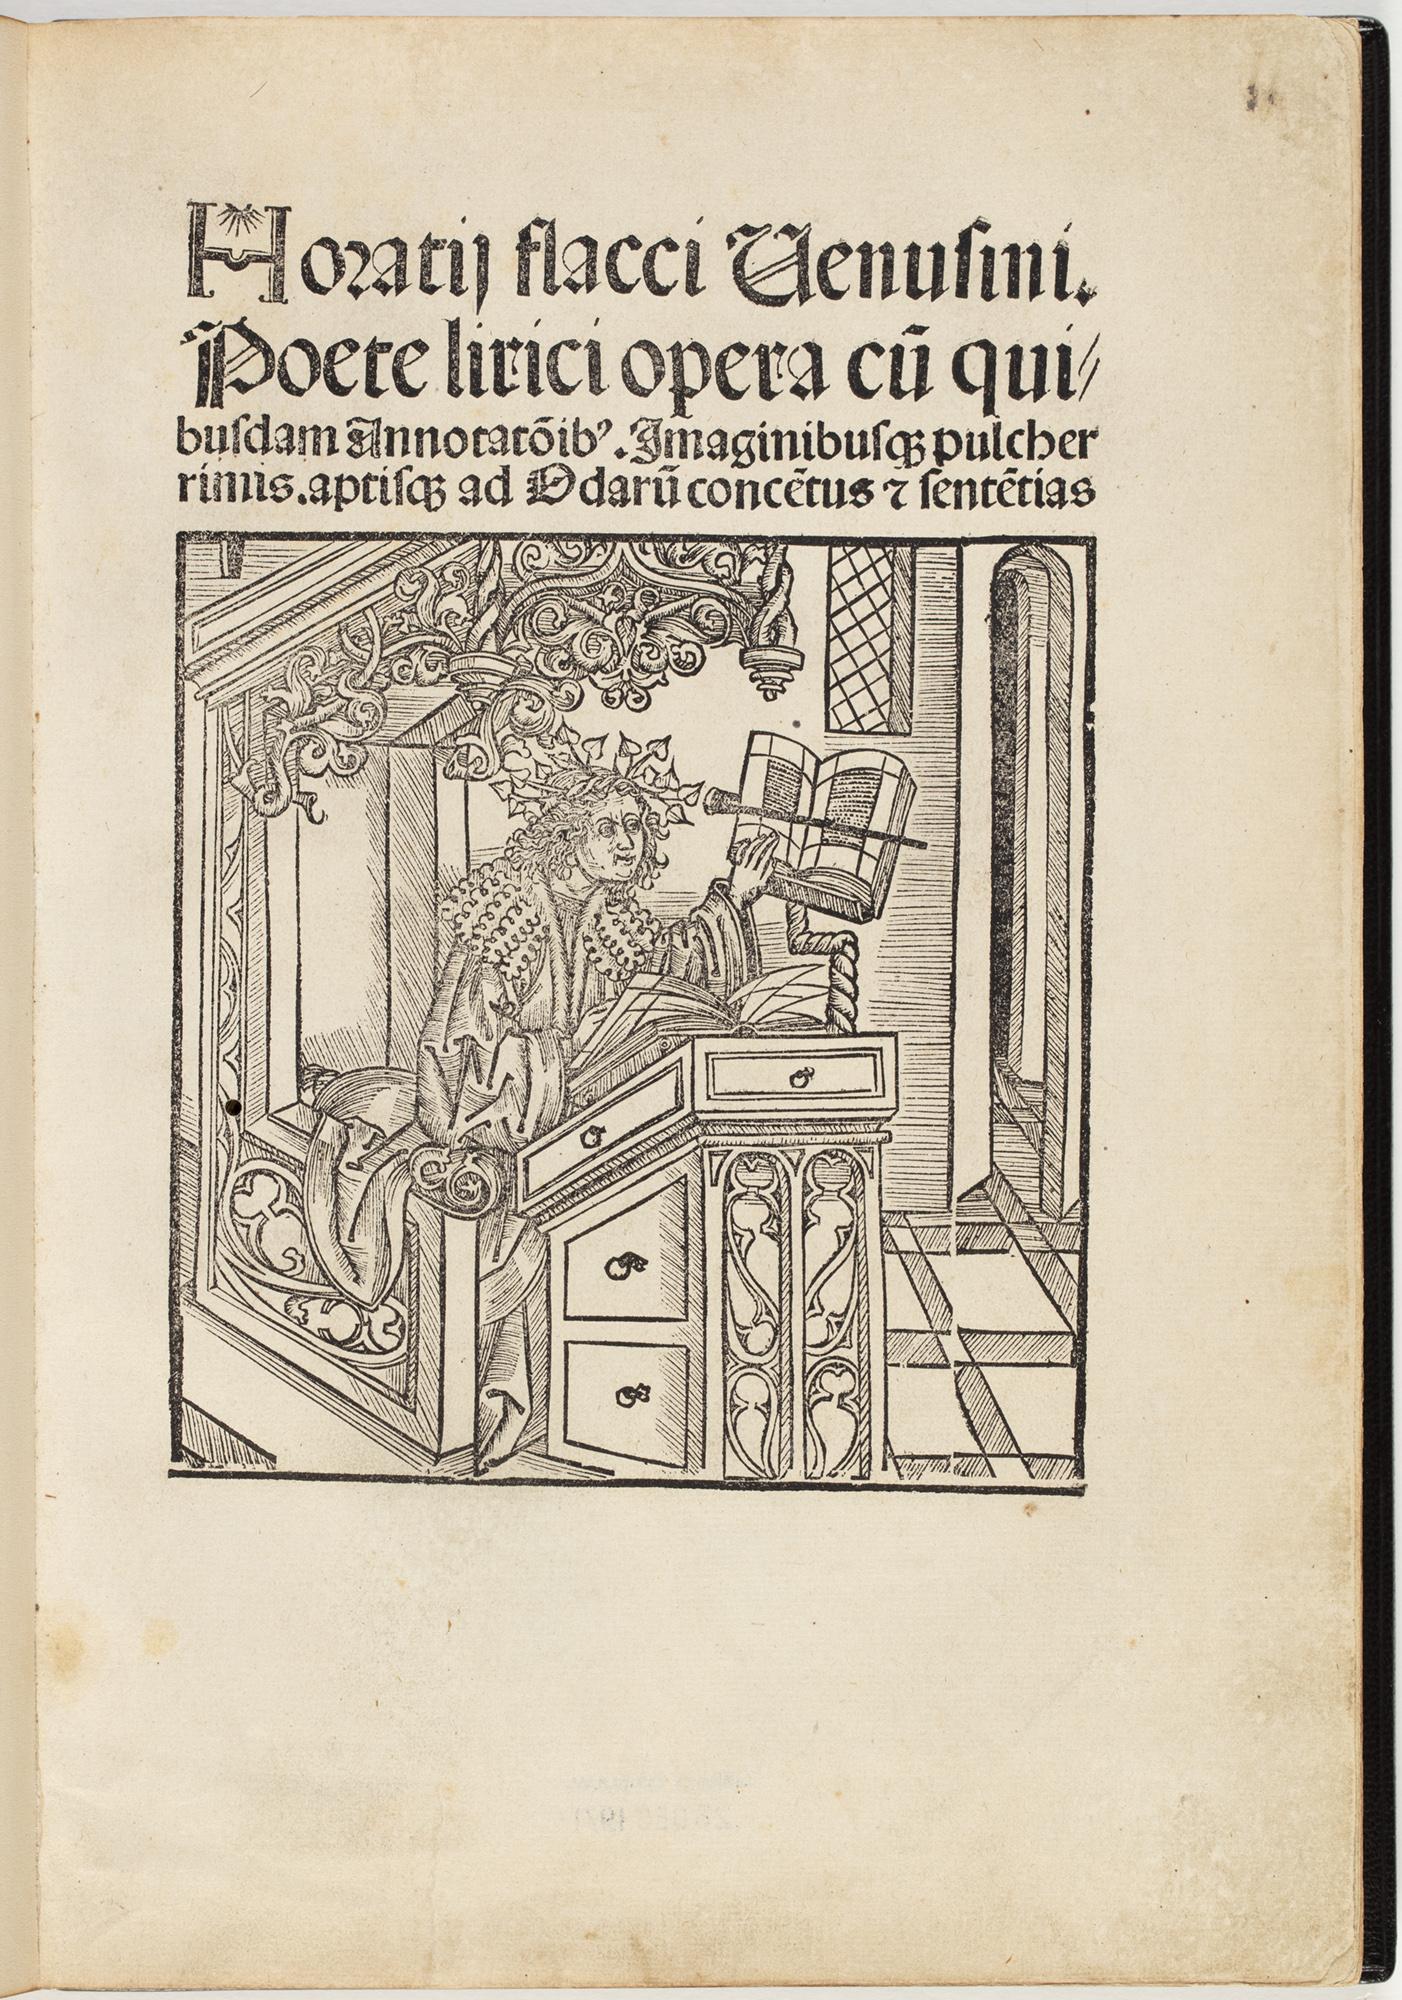 Horatij flacci Venusini Poete lirici opera, 1498, by Horace